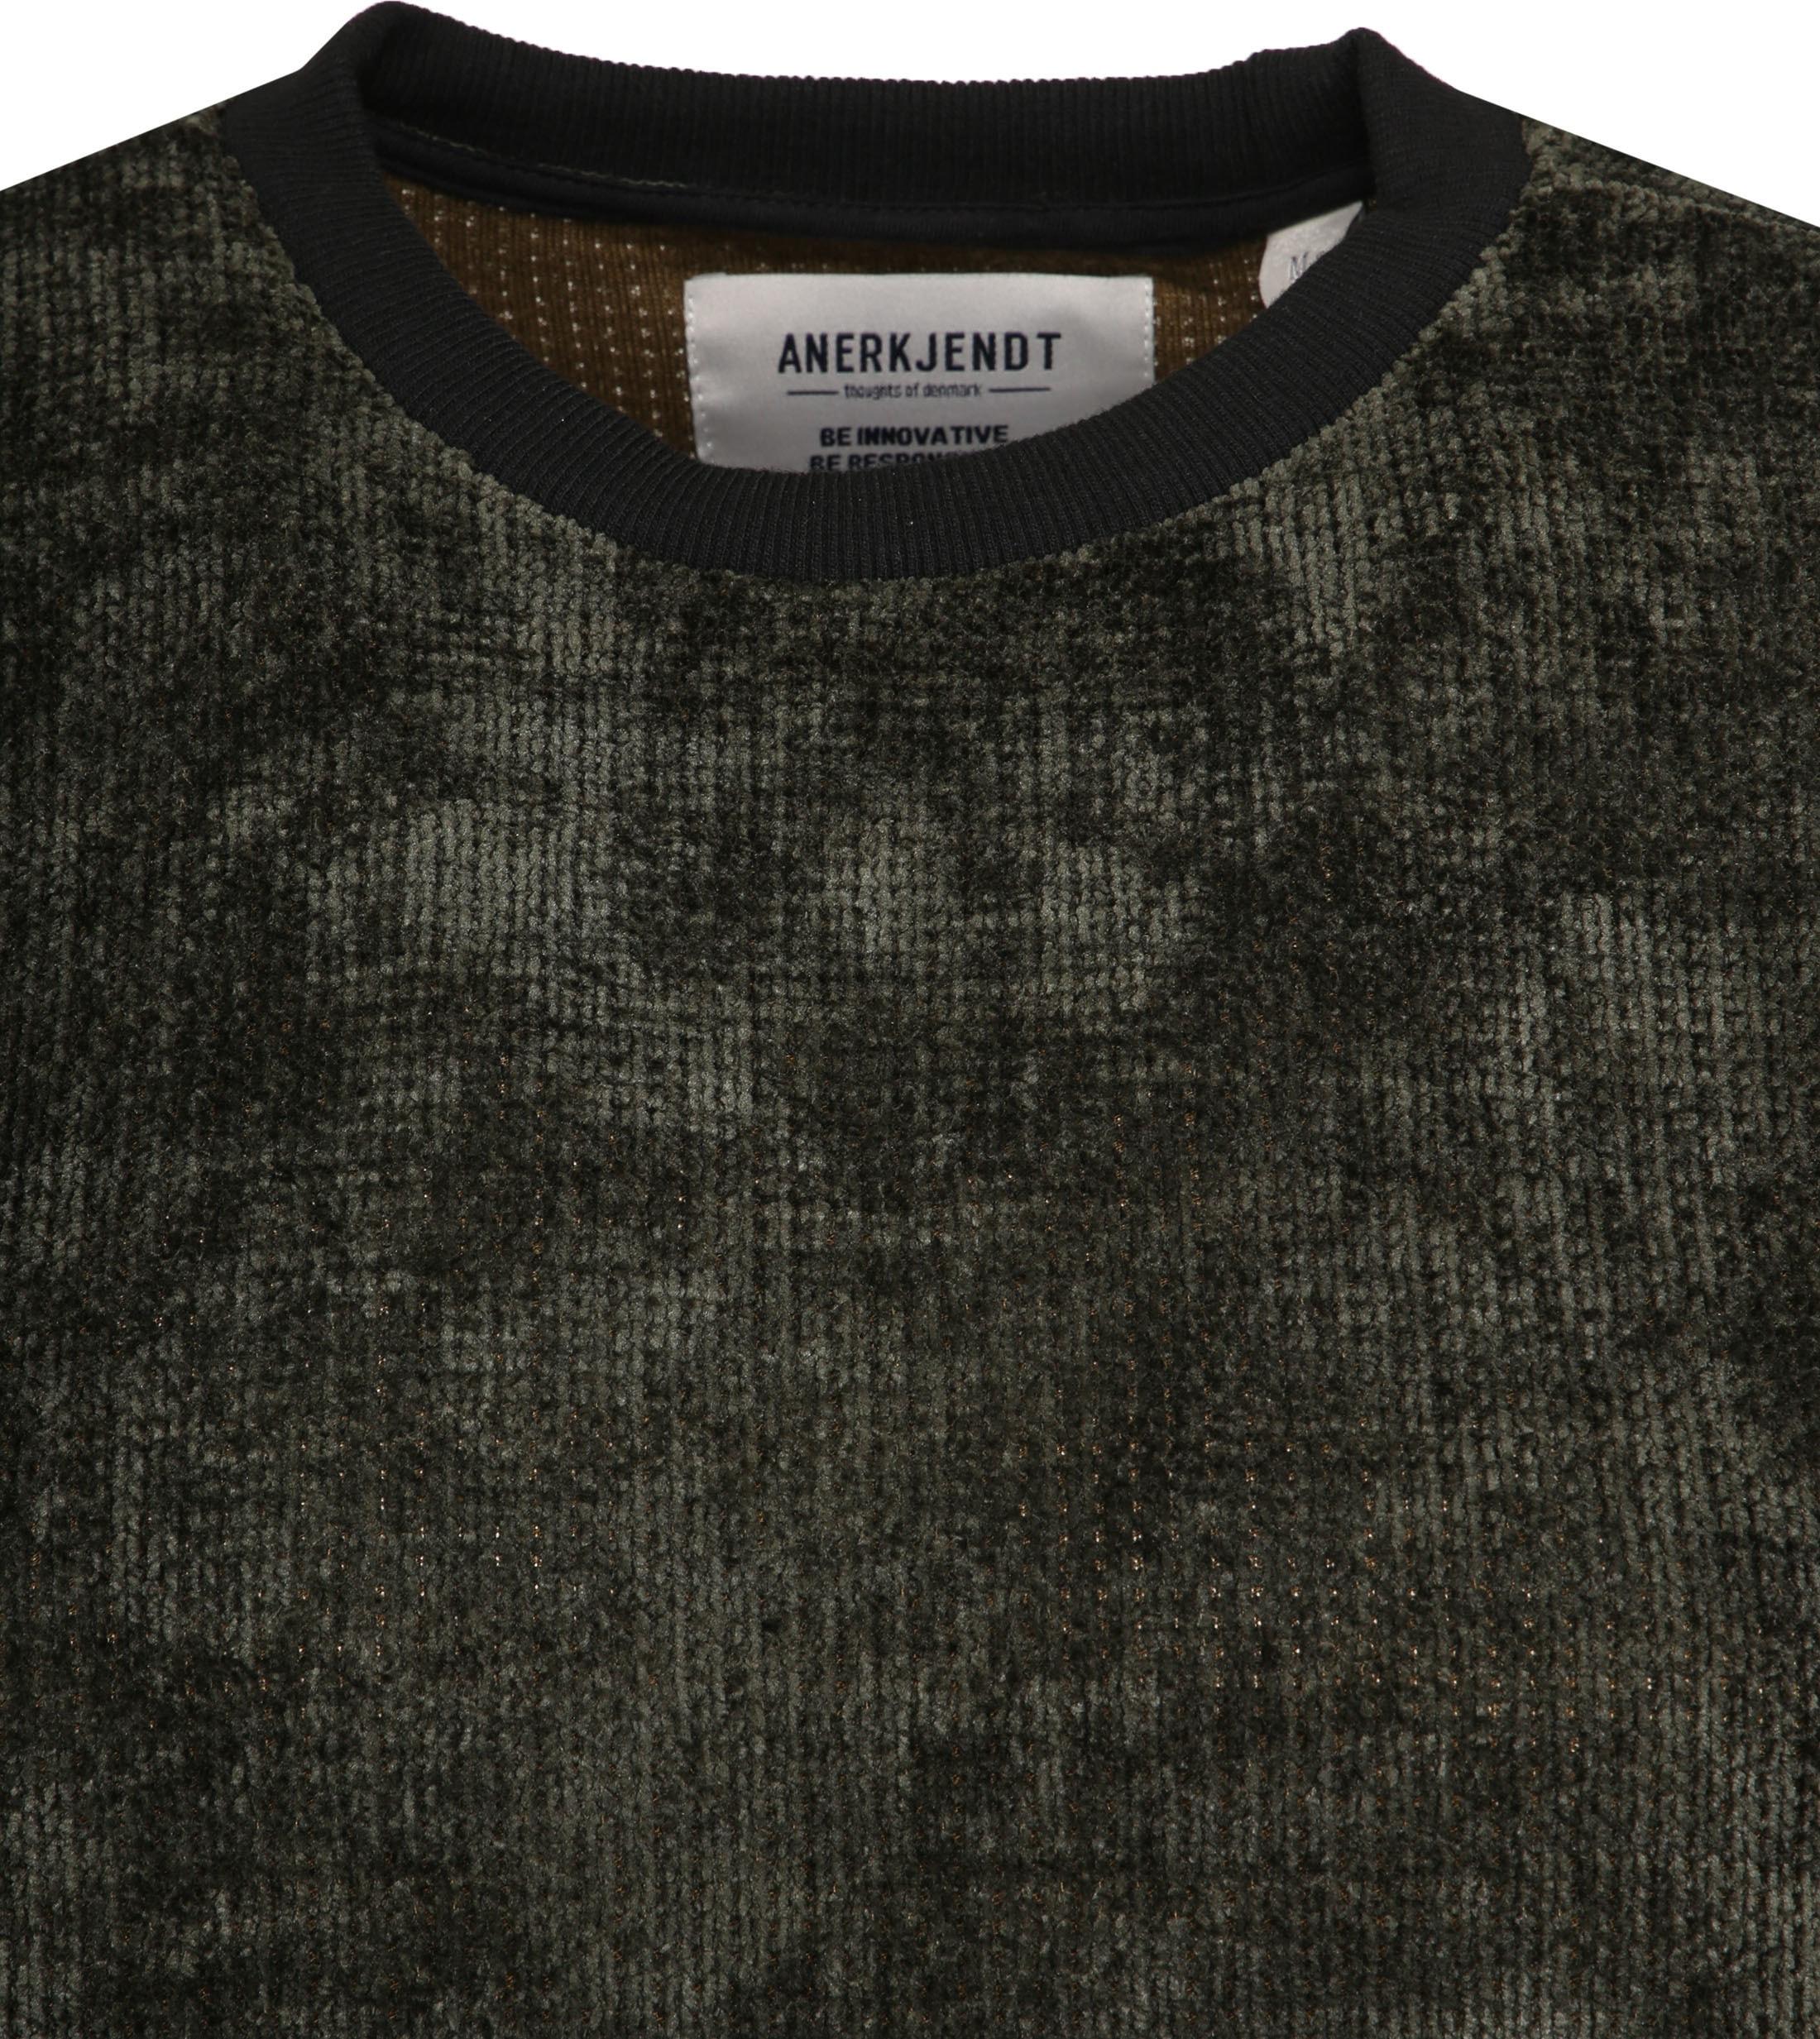 Anerkjendt Akalex Sweater Dark Green foto 1